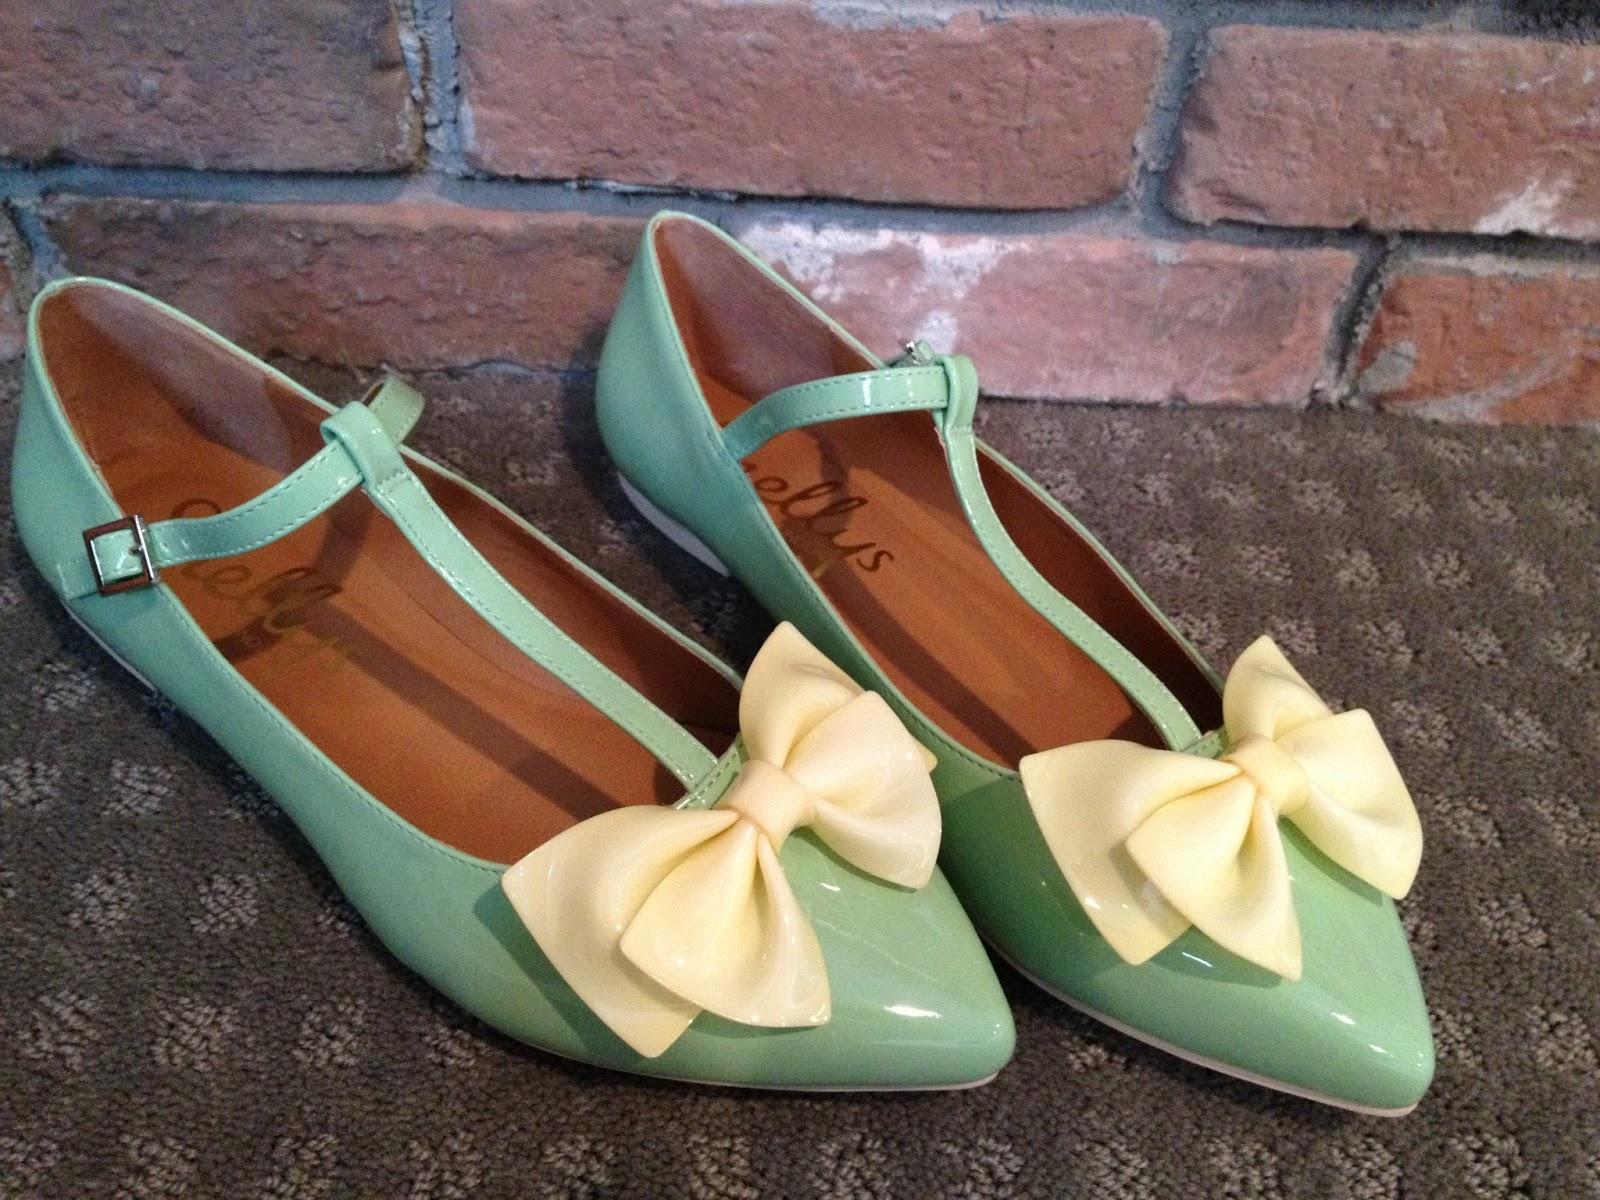 bow shoes, european shoes, yellow bows, seafoam green shoes, shoes, designer shoes, brick wall, brick, yellow, green, tstrap, t strap shoes